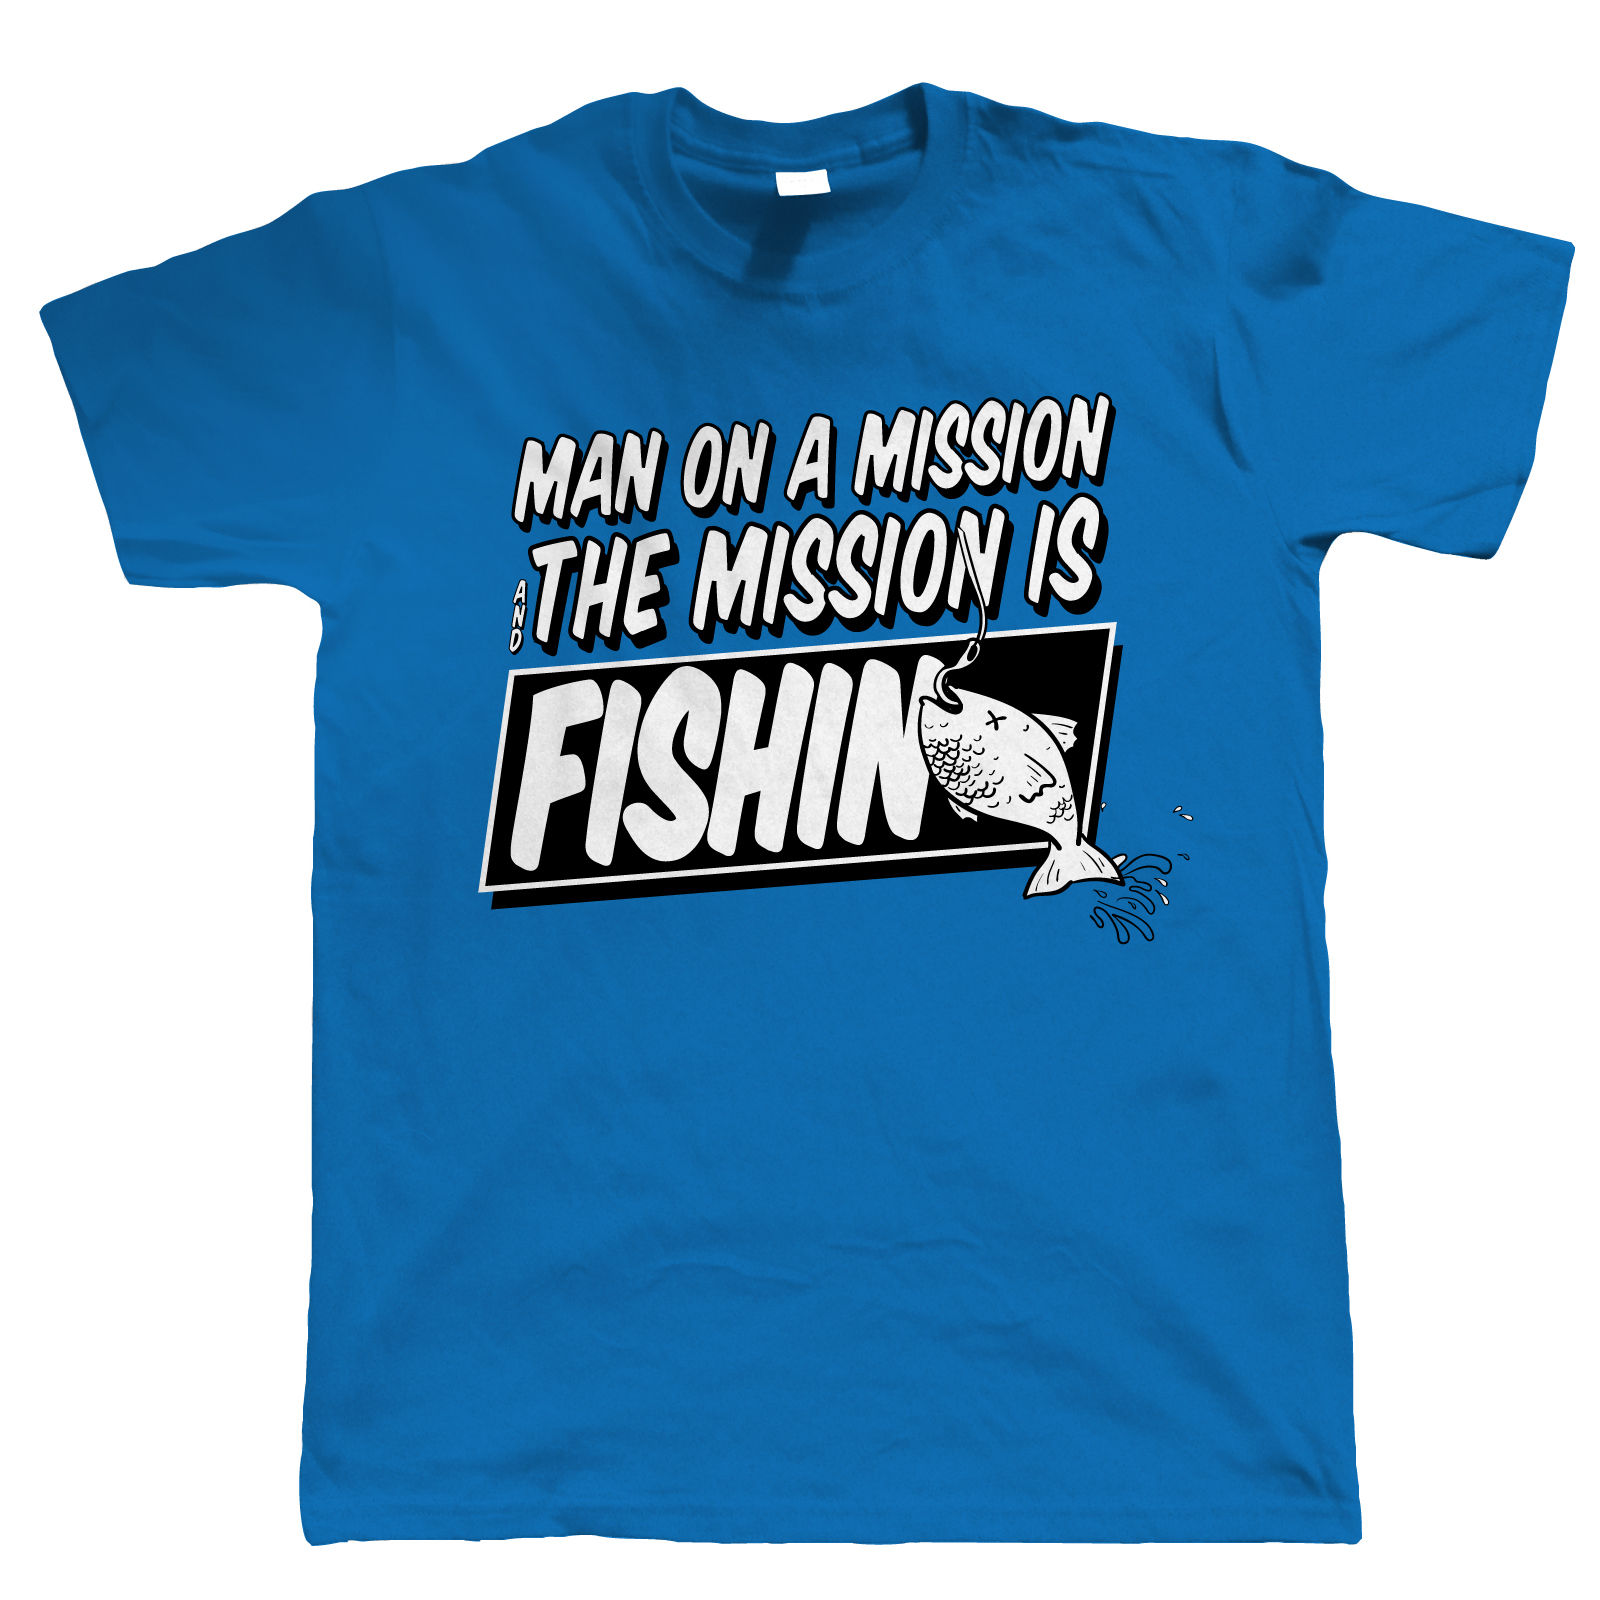 Man On A Mission, Funny Fishinger T-Shirt, Carp Angler Gift for Him Dad Grandad 2018 Summer T-Shirts For Men